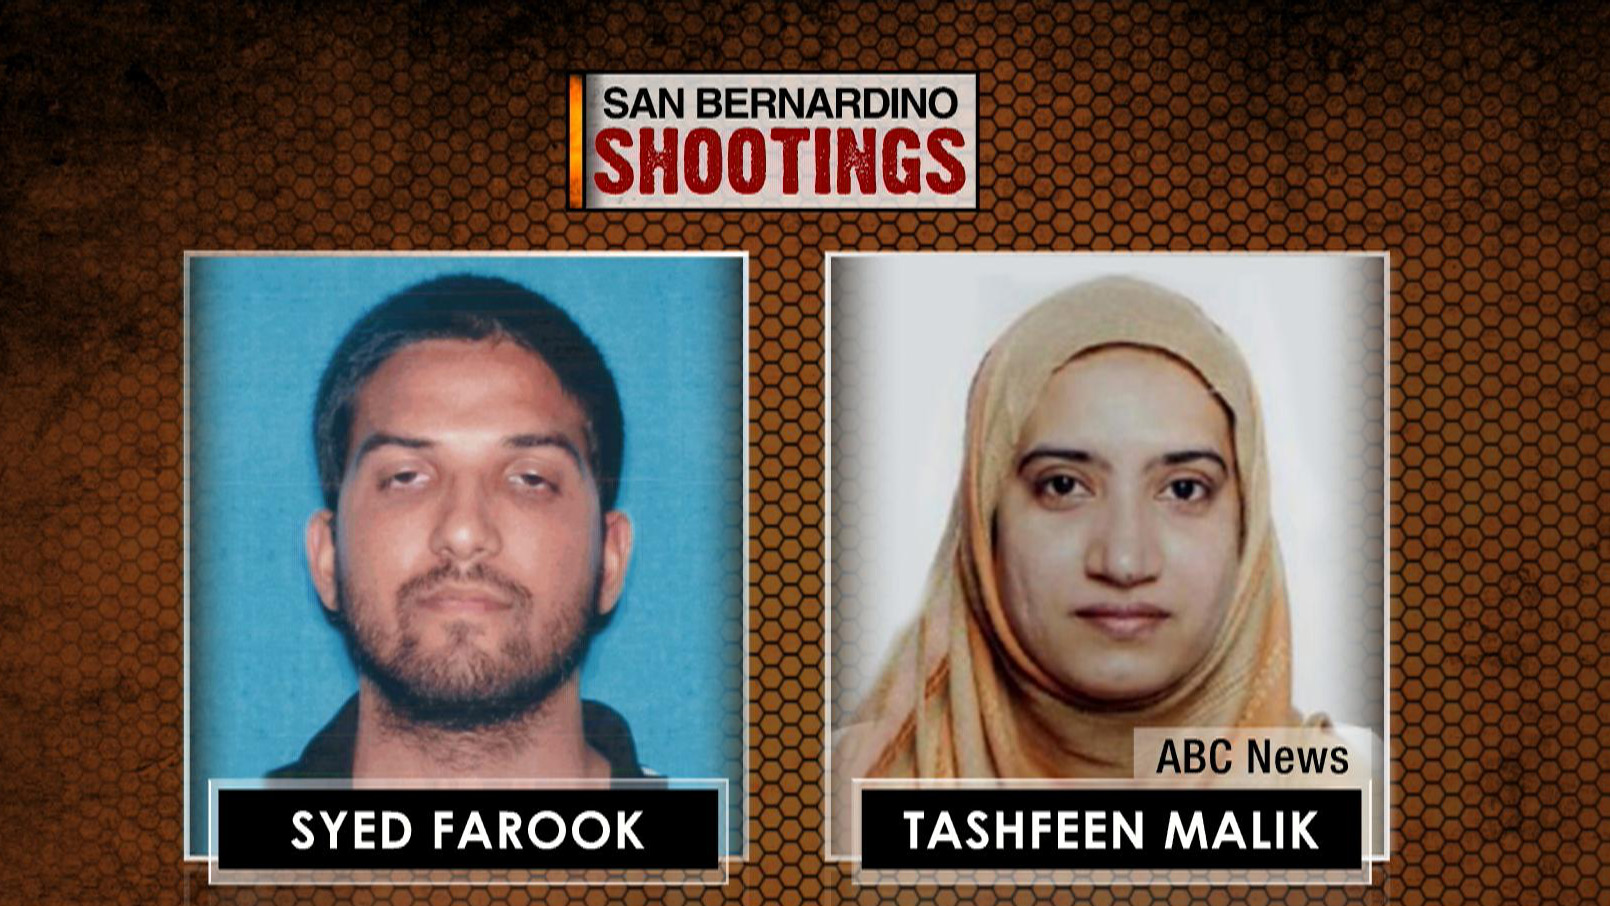 San Bernardino Shooting Being Investigated as Act of